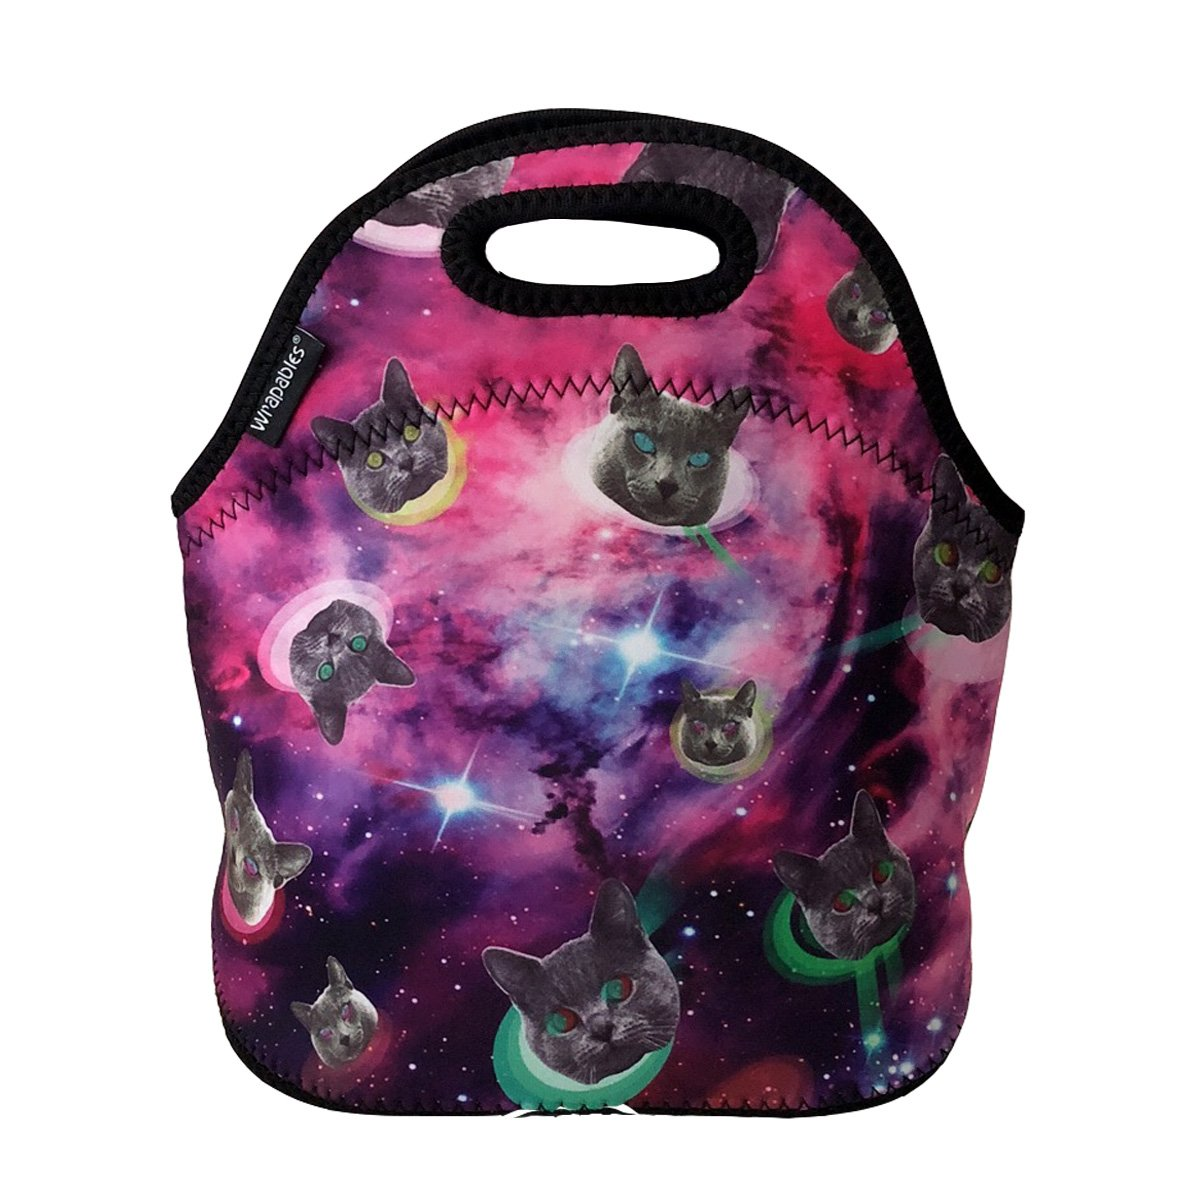 ALLYDREW Insulated Neoprene Lunch Bag Zipper Lunch Box Tote Baby Bottle Bag Owls